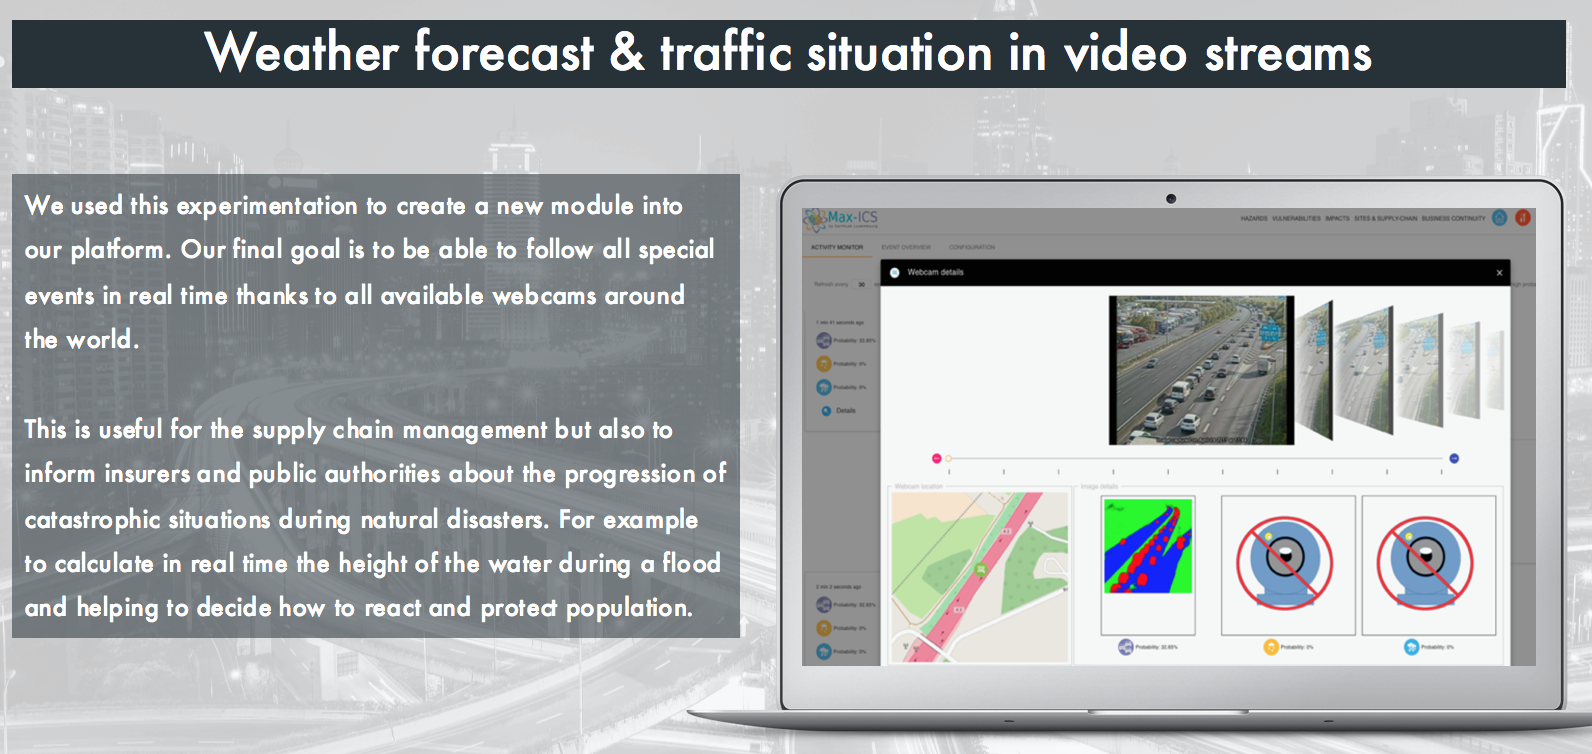 Webcam analysis